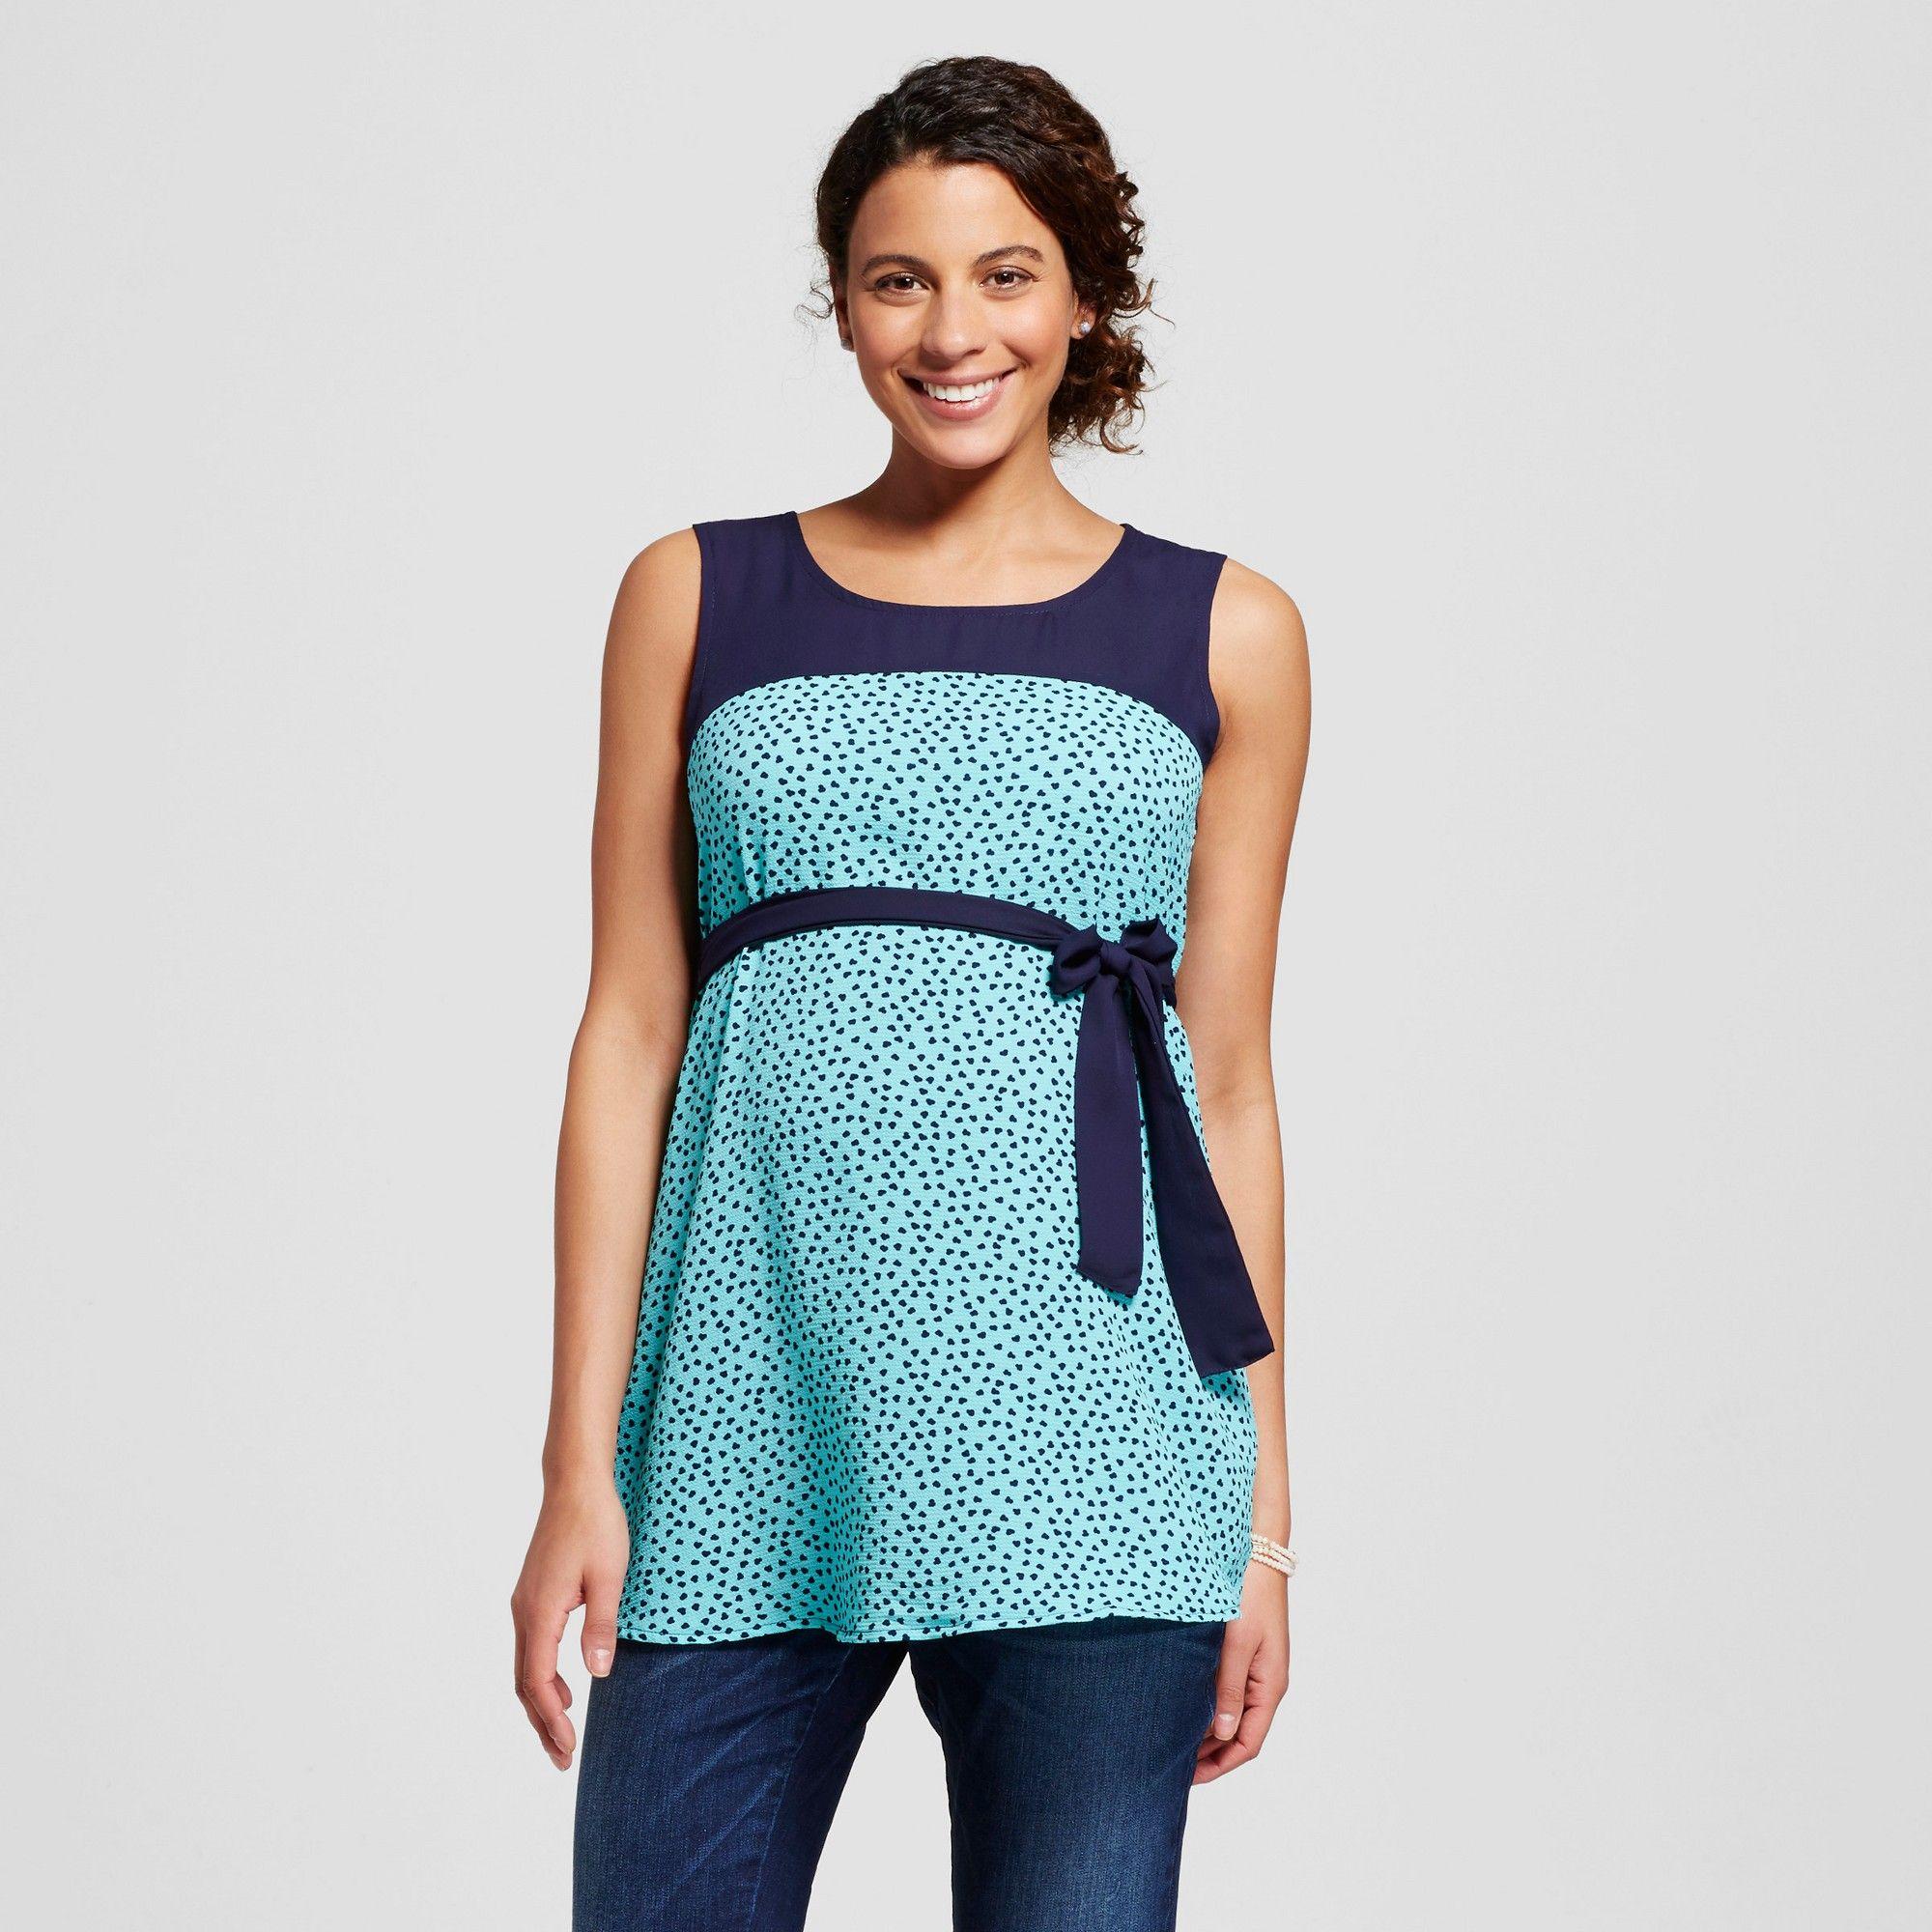 Maternity Polka Dot Print Belted Sleeveless Top Blue S - Ma Cherie ...